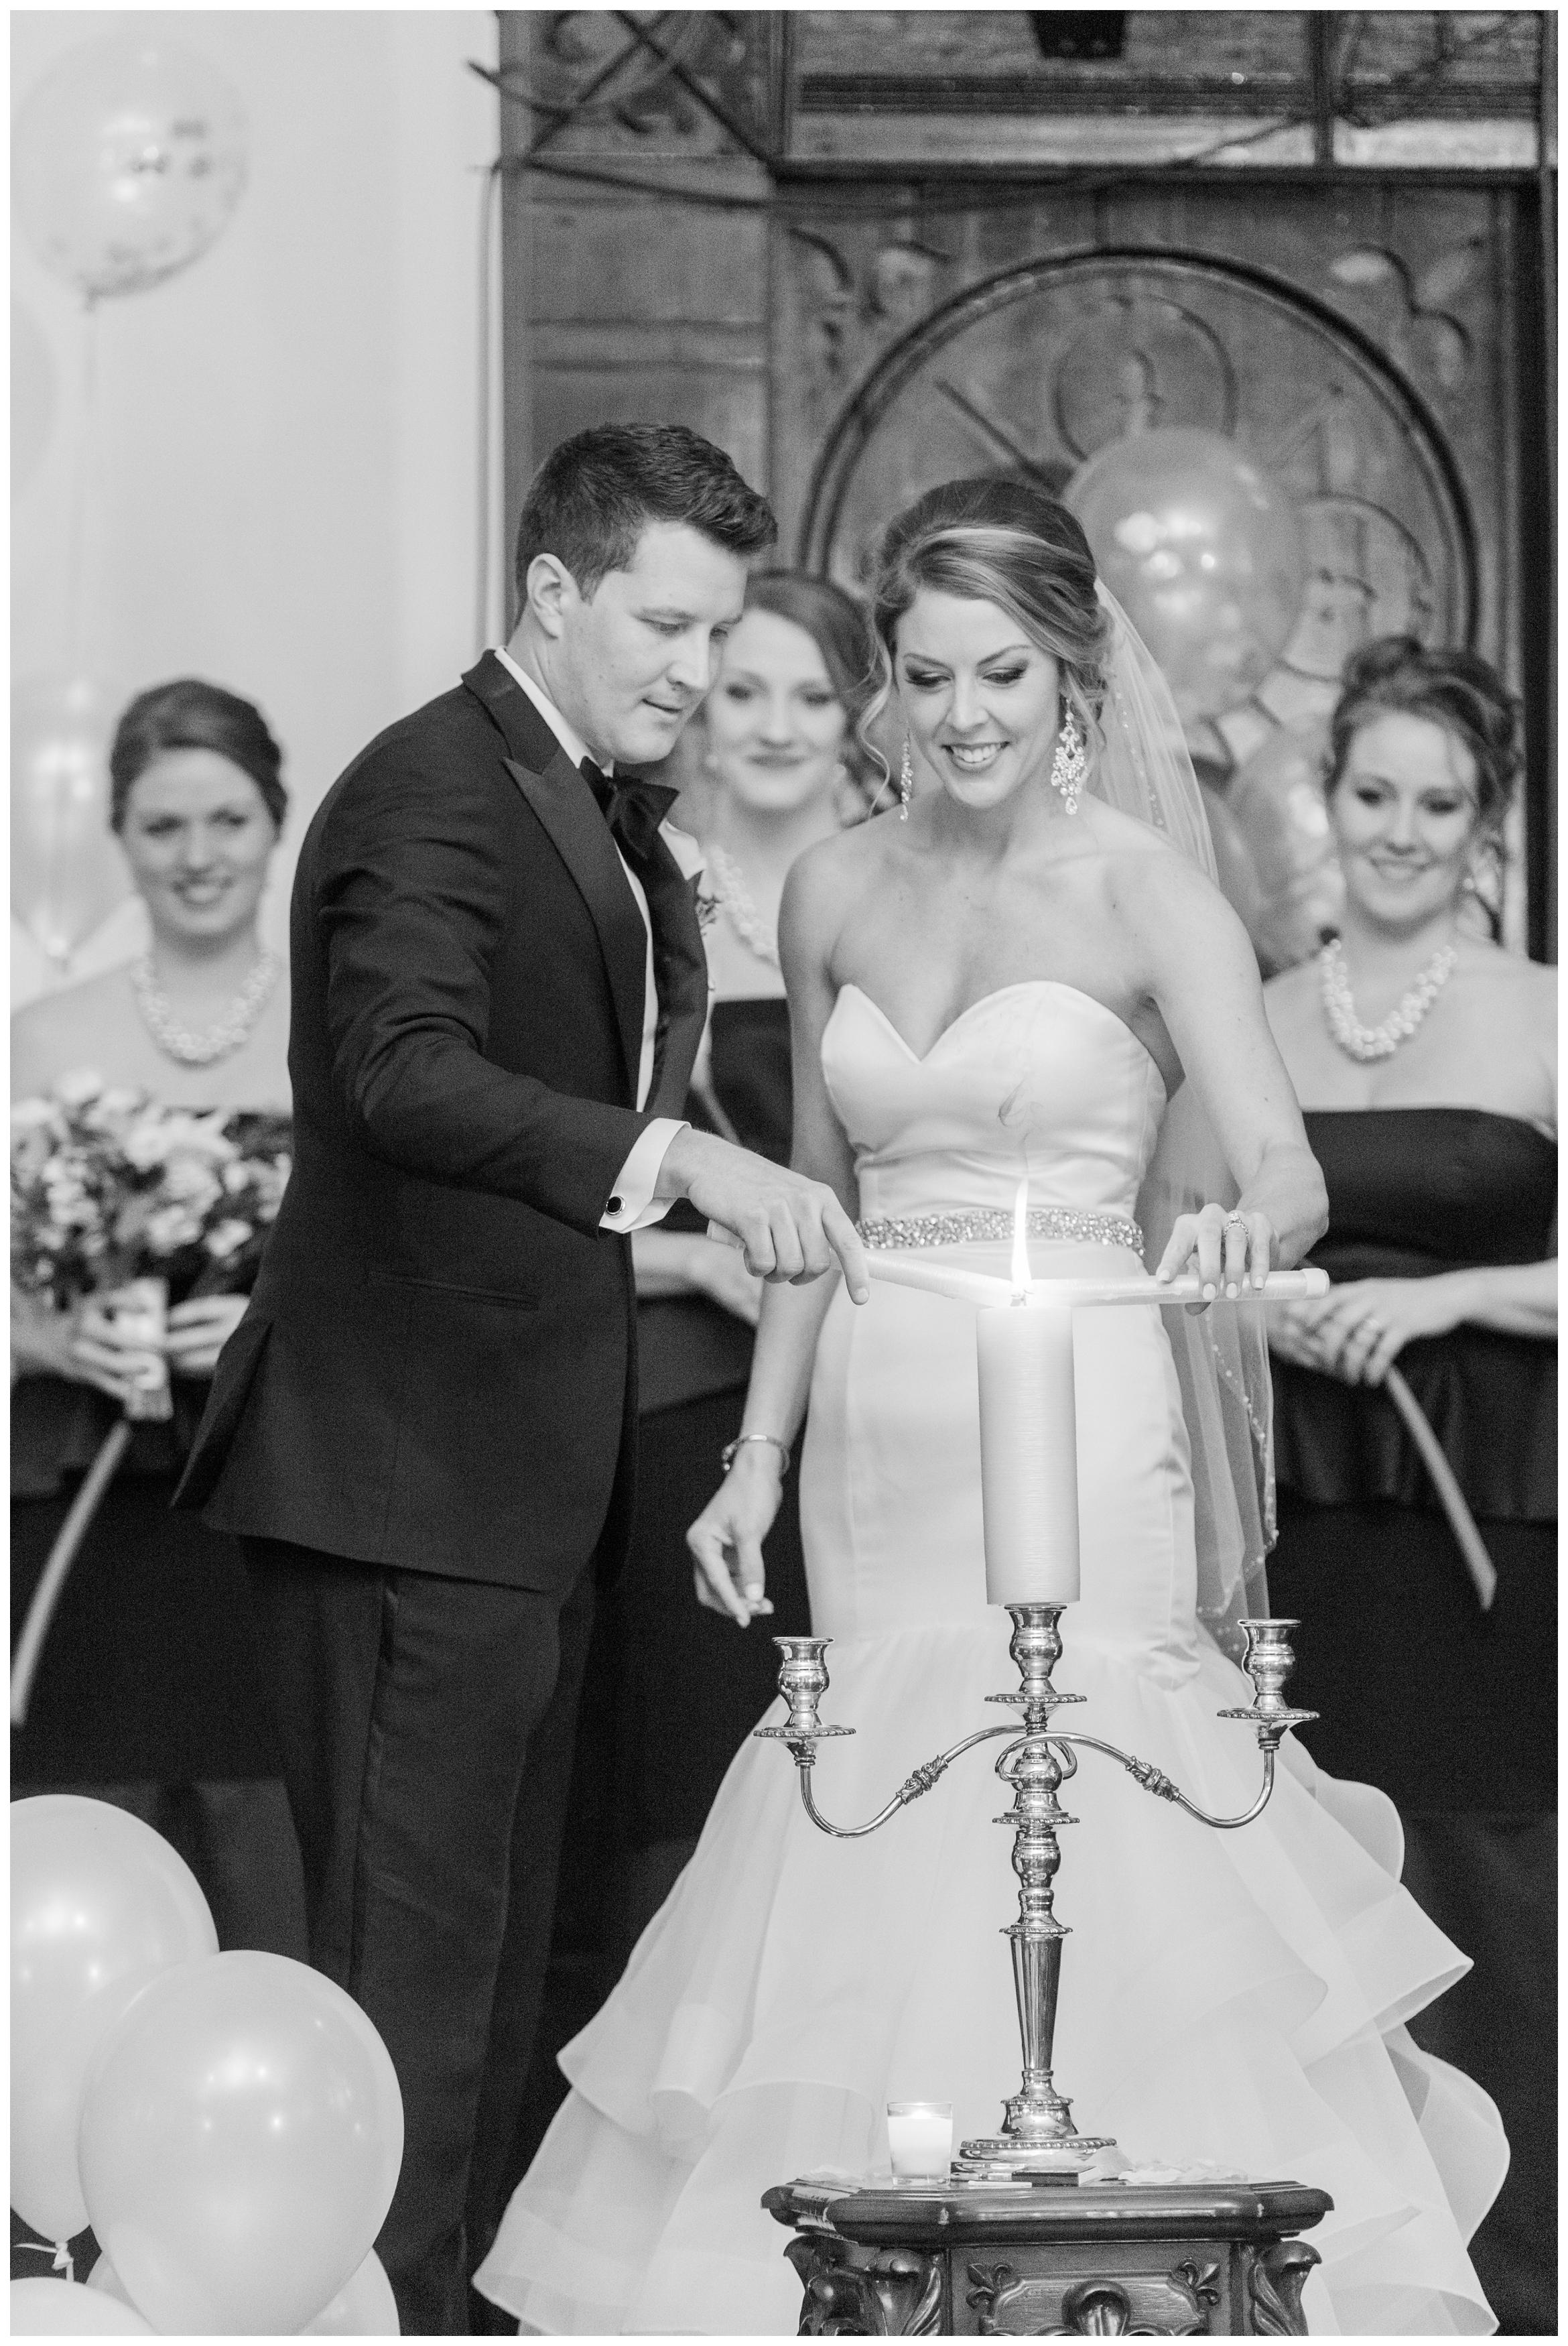 Rebecca_Bridges_Photography_Indianapolis_Wedding_Photographer_5833.jpg